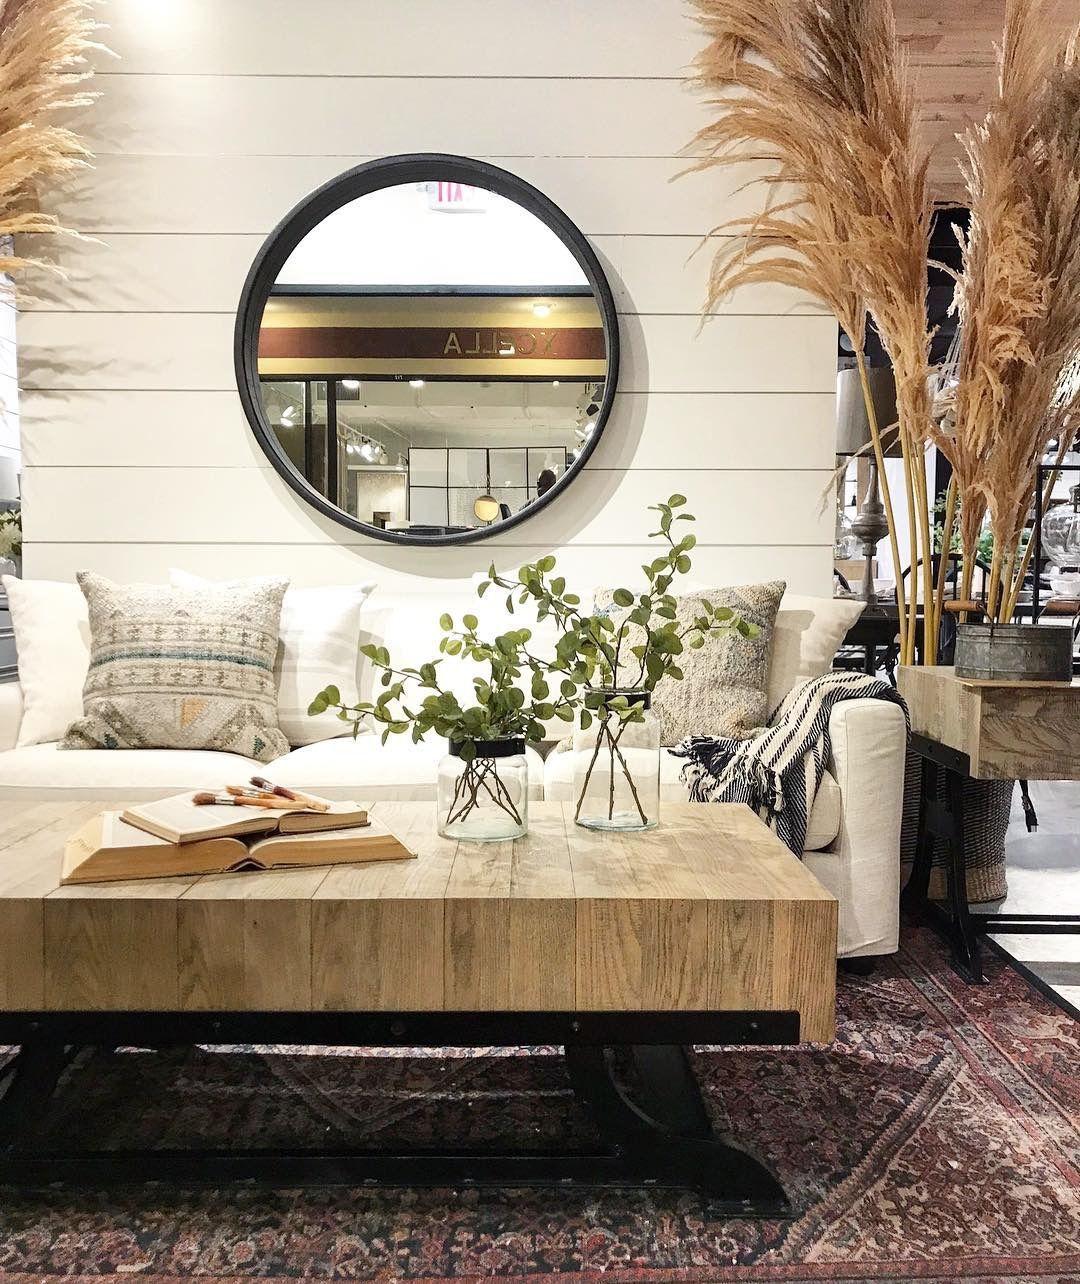 Magnolia Homes Interiors: Magnolia Home Furniture (With Images)